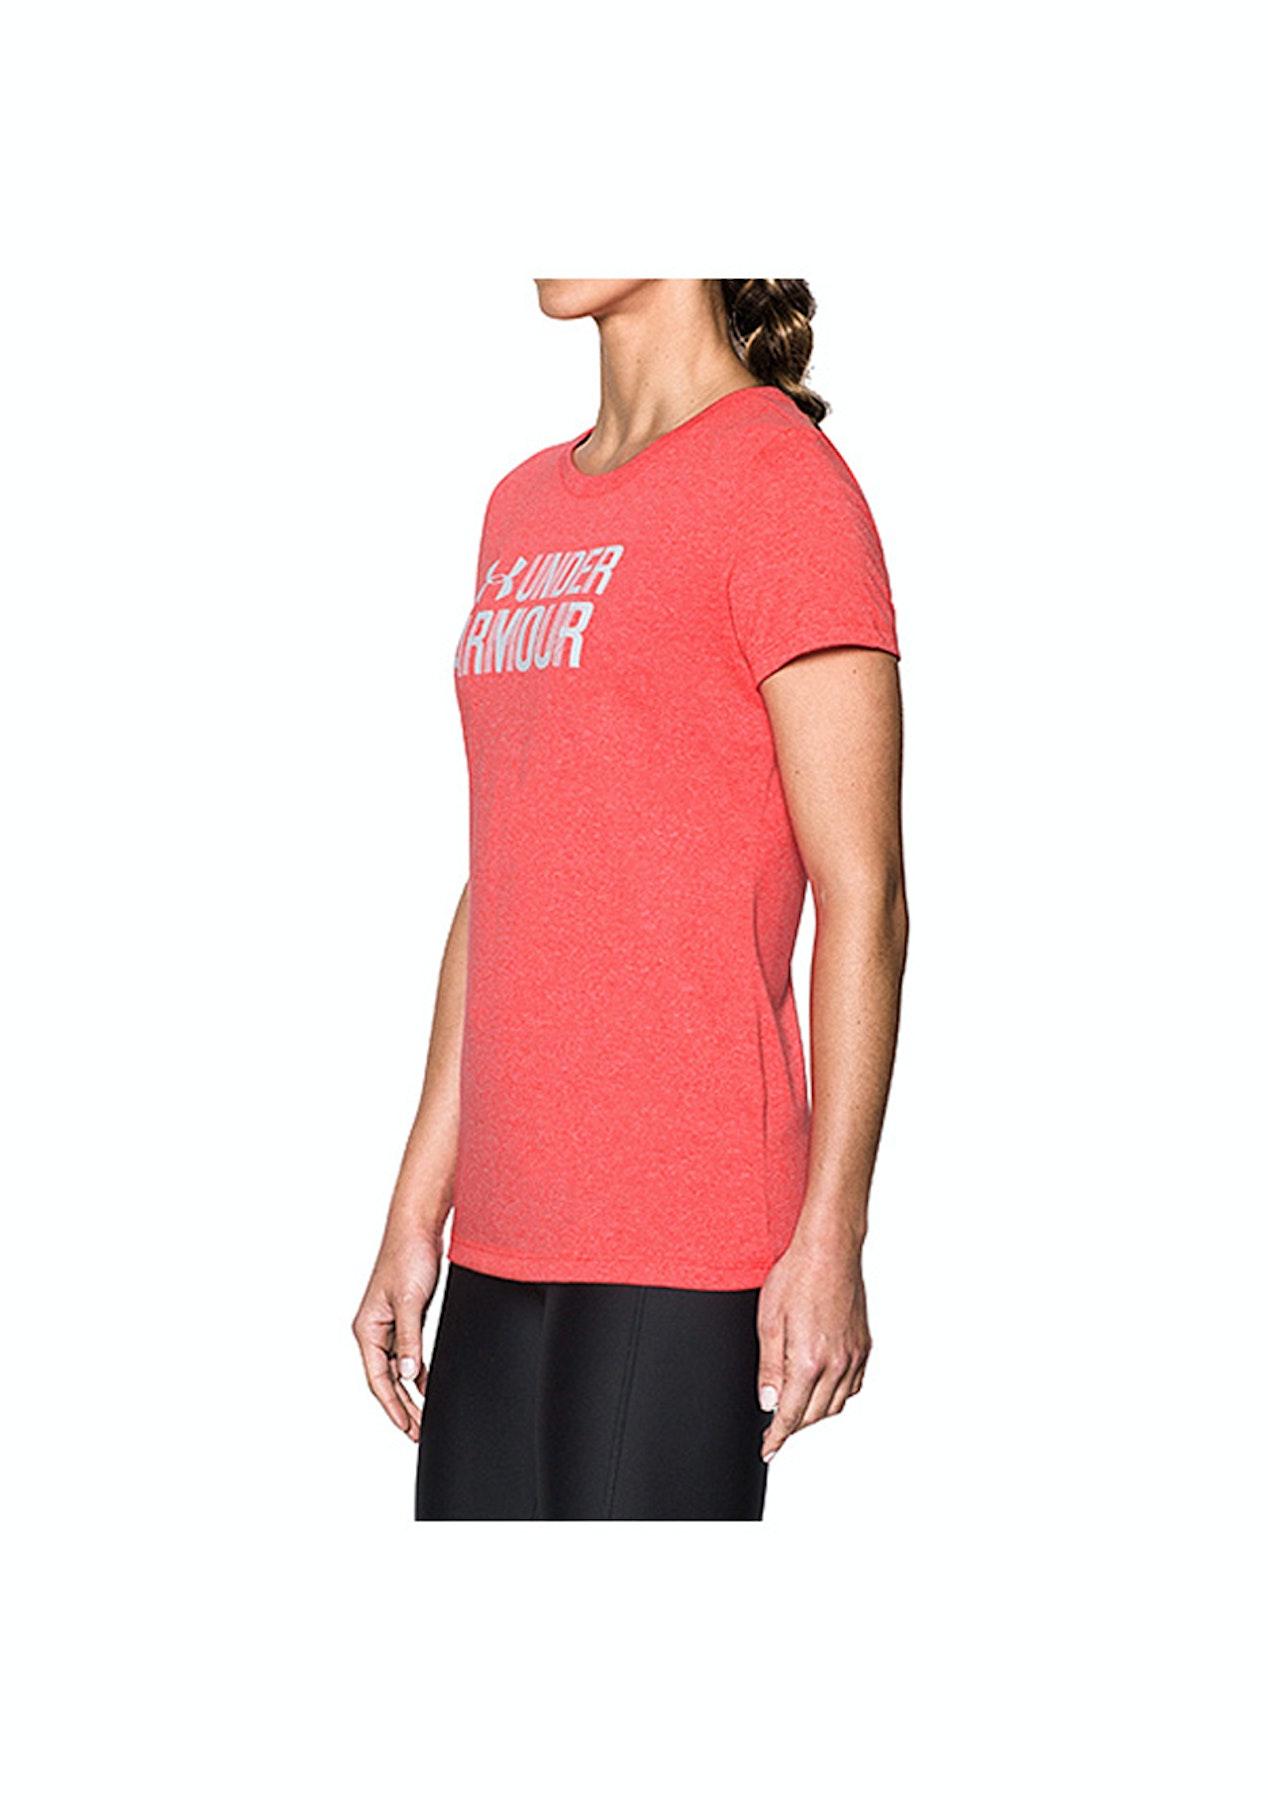 506270ae3c936 Under Armour - Threadborne Ssc Twist Graph - Marathon Red  White - Once a  Year Under Armour Womens - Onceit